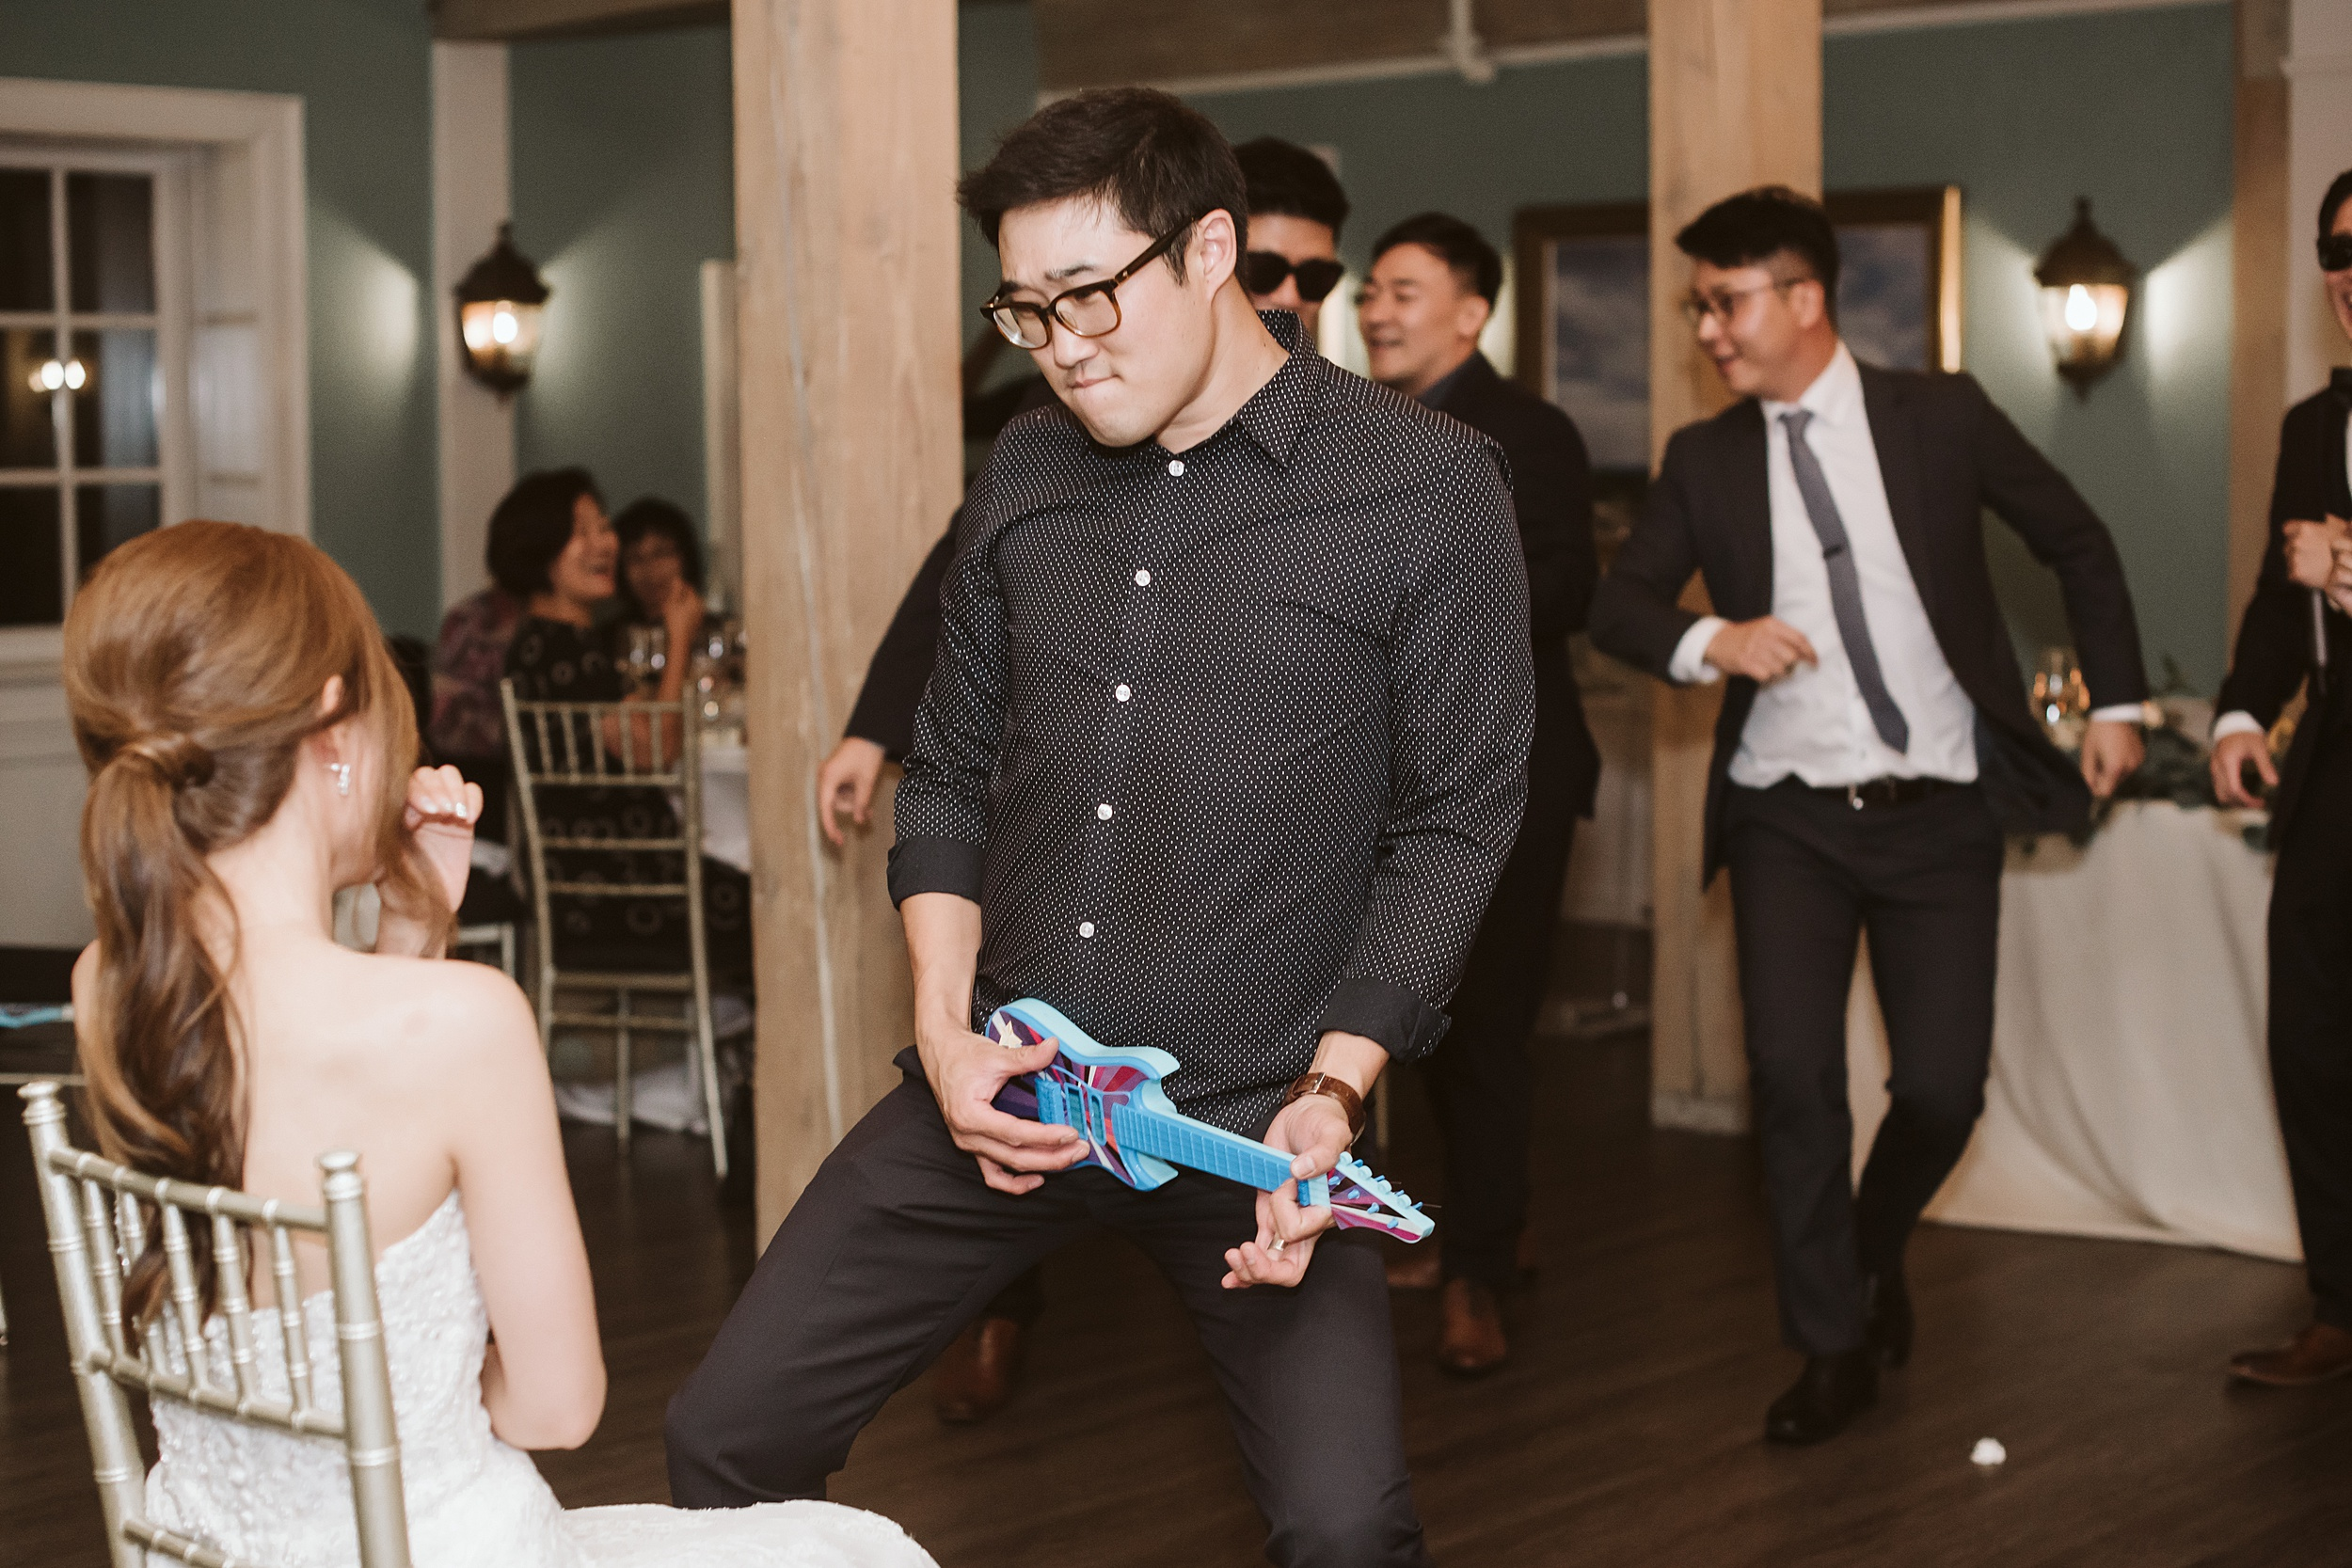 Doctors_House_Kleinburg_Wedding_Toronto_Photographer_0121.jpg